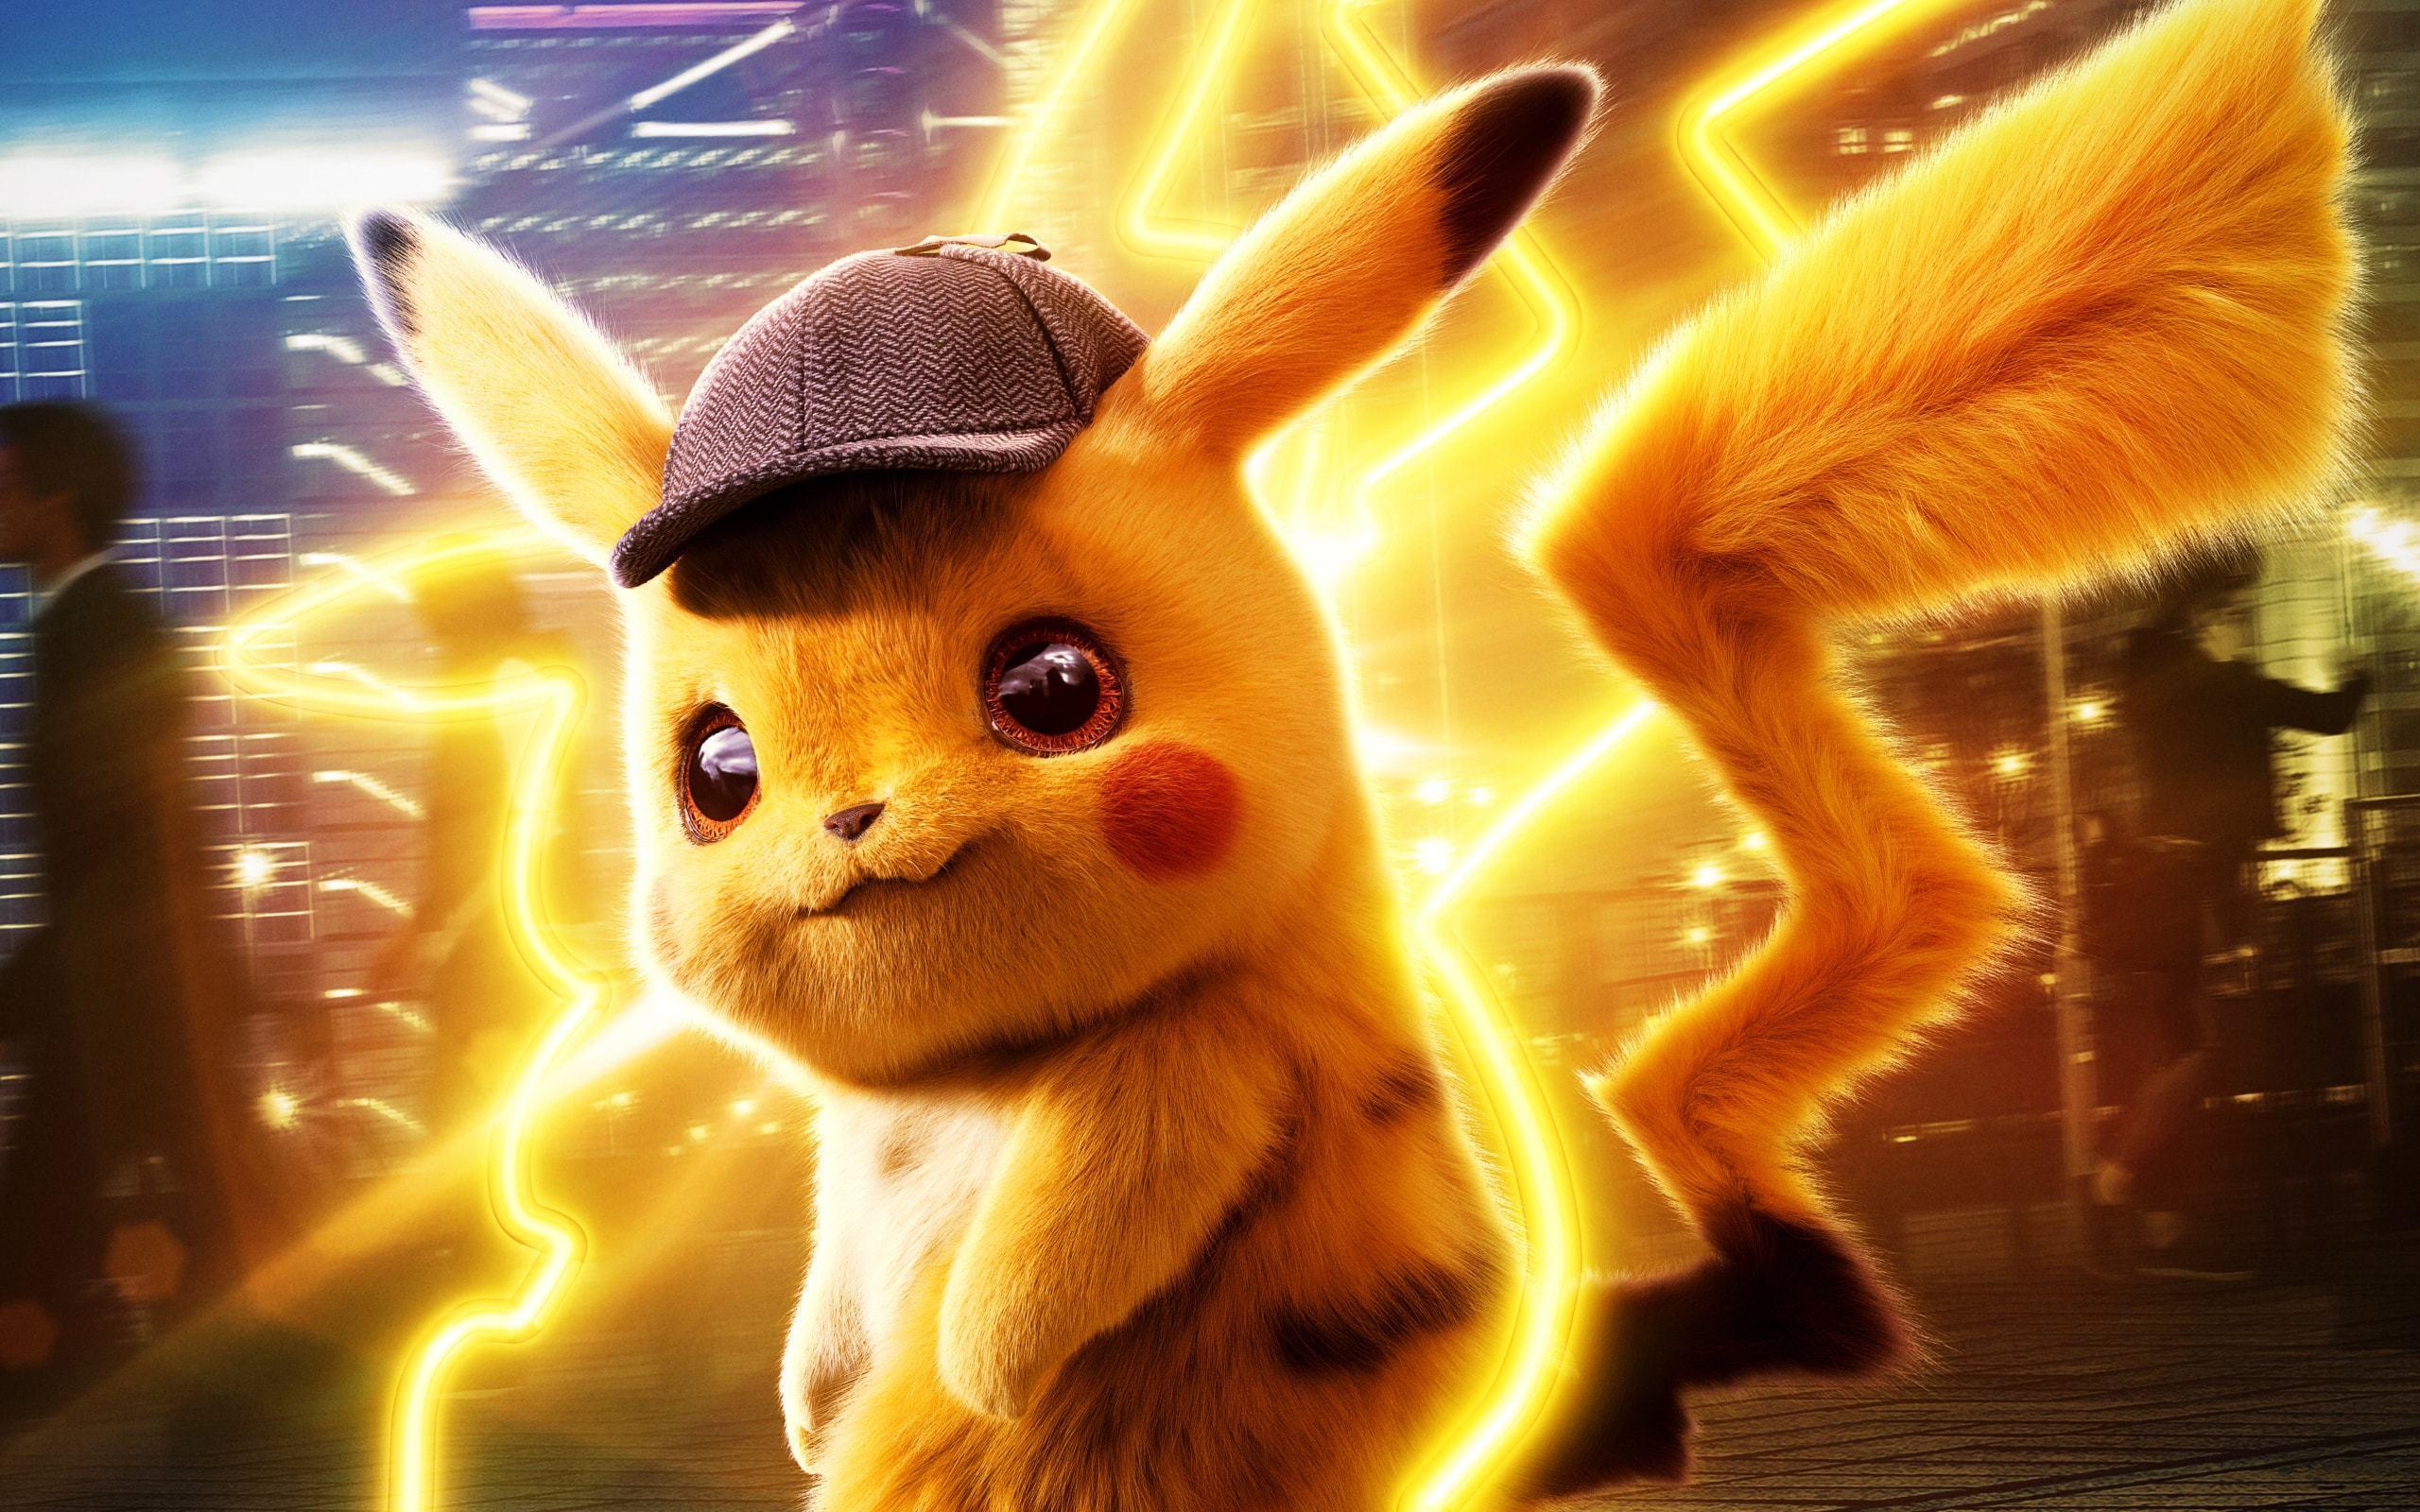 Anime 2560x1600 Pokémon Pikachu Pokémon Detective Pikachu movies hat lightning